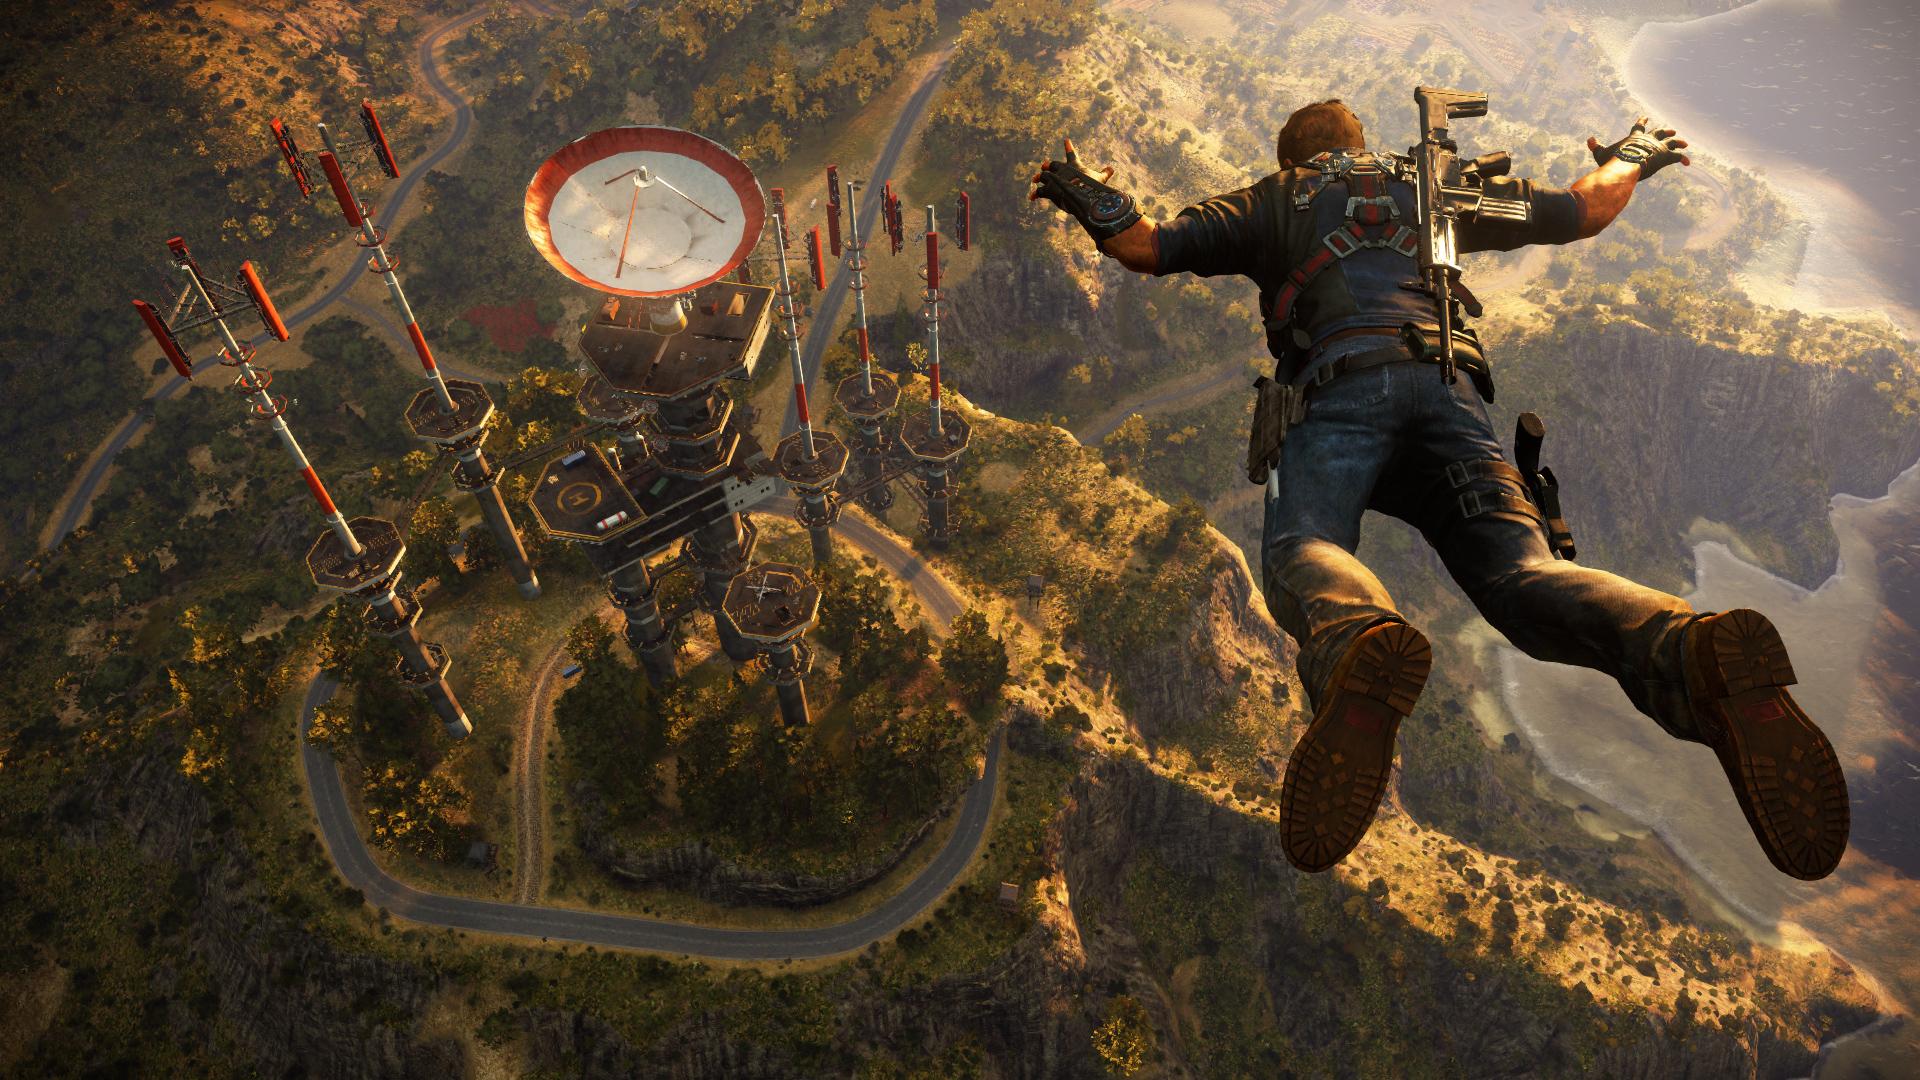 The Just Cause 3 multiplayer mod will get an official release next week screenshot